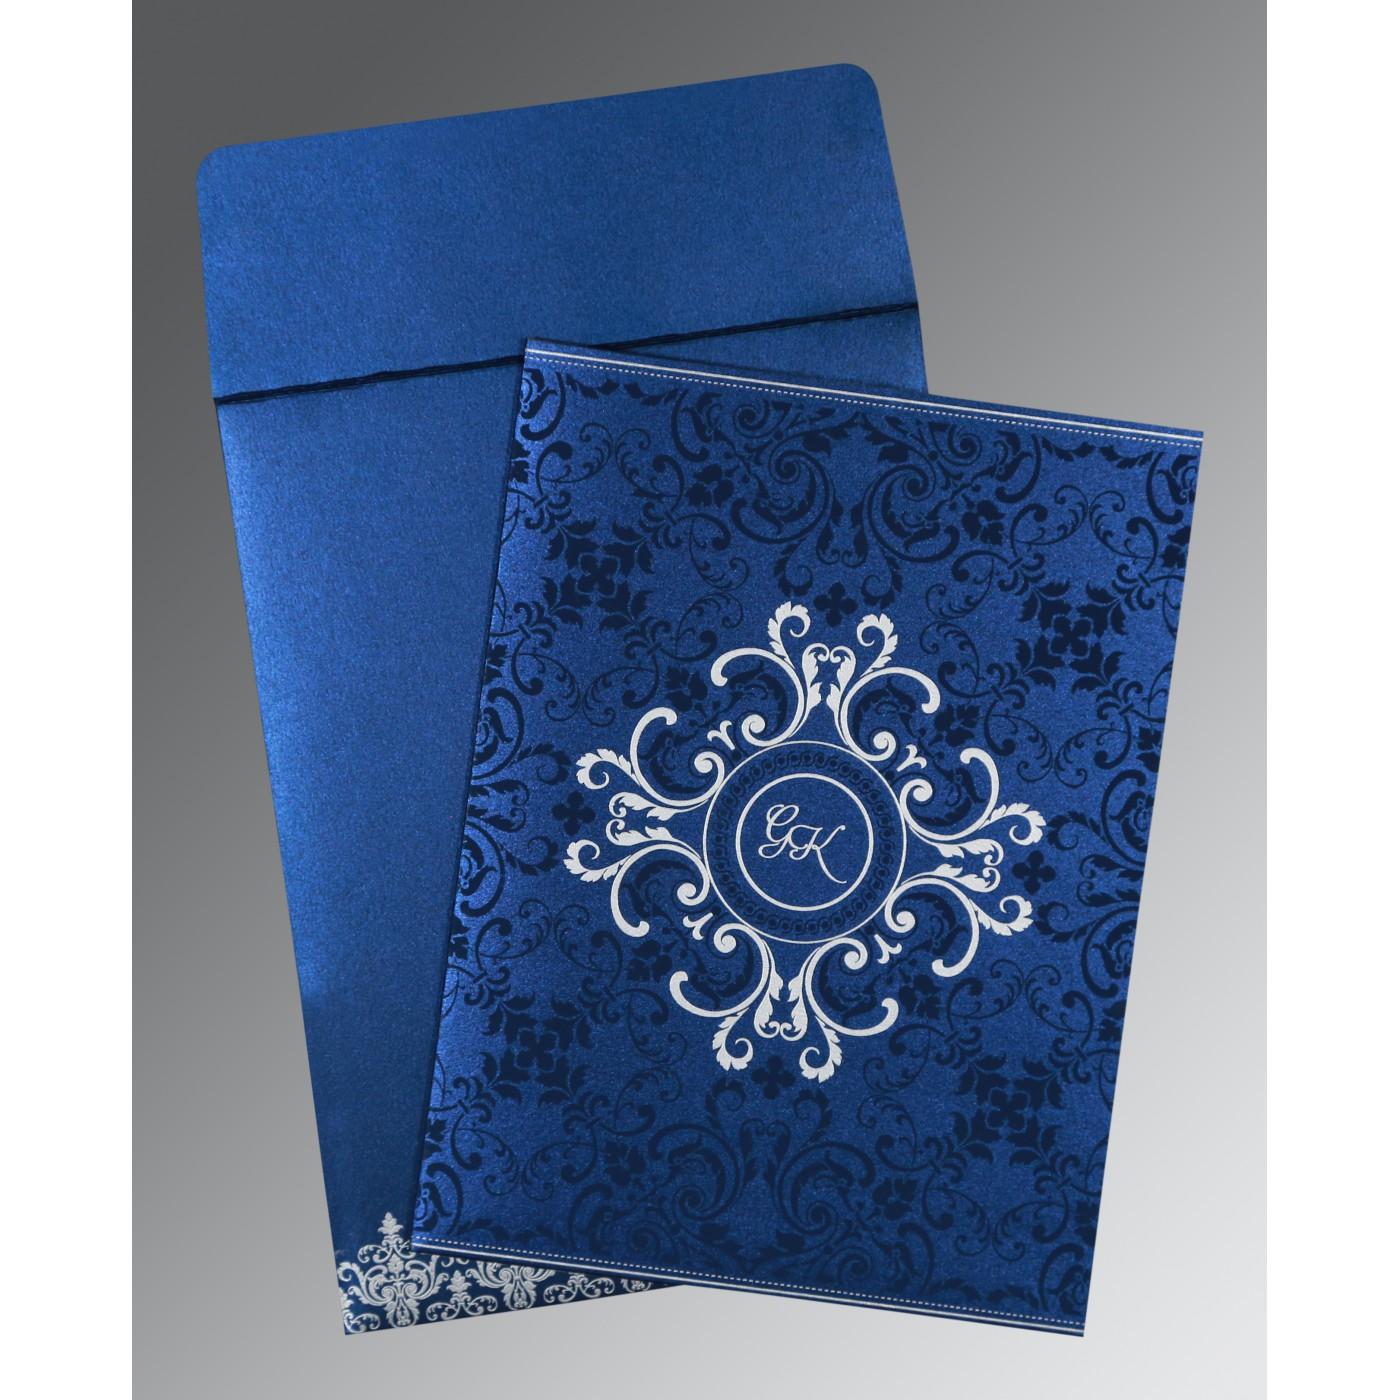 COBALT BLUE SHIMMERY SCREEN PRINTED WEDDING CARD : C-8244K - 123WeddingCards